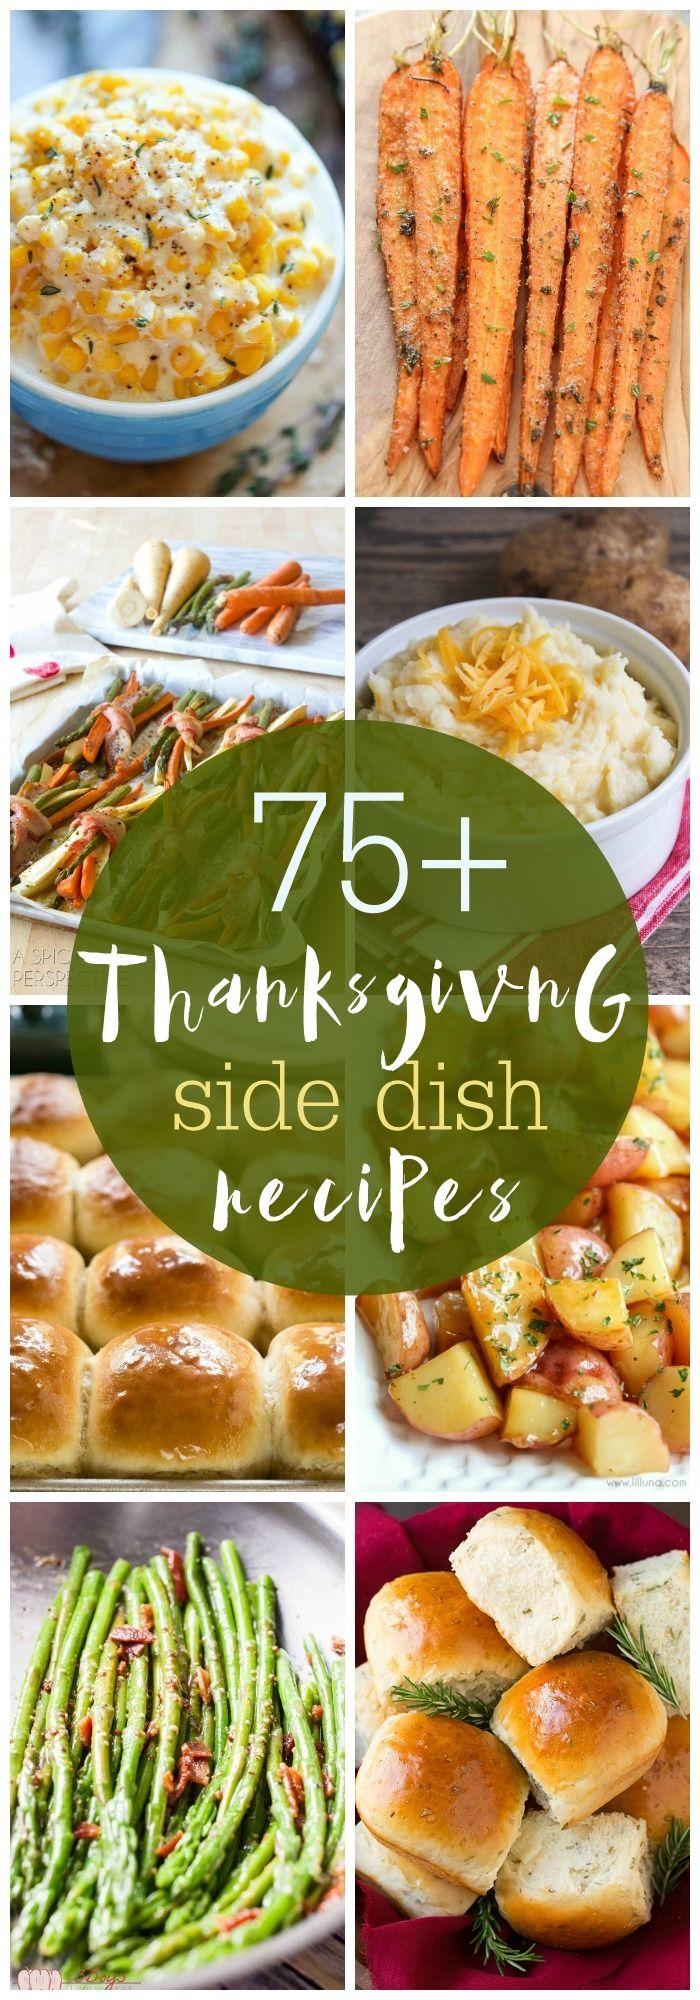 75+ Thanksgiving Side Dish Recipes FoodBlogs.com